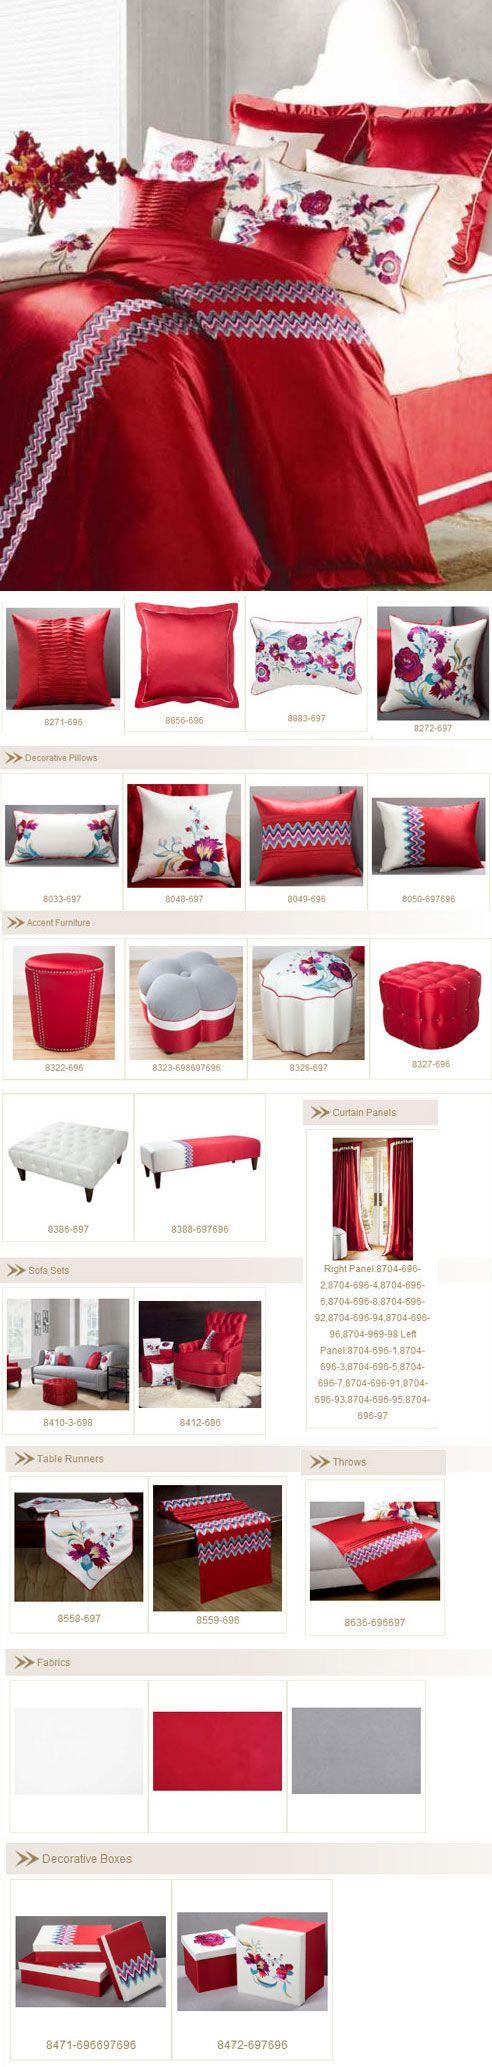 http://www.beddingsuperstore.com/i?store=cat=13058-Furnishings